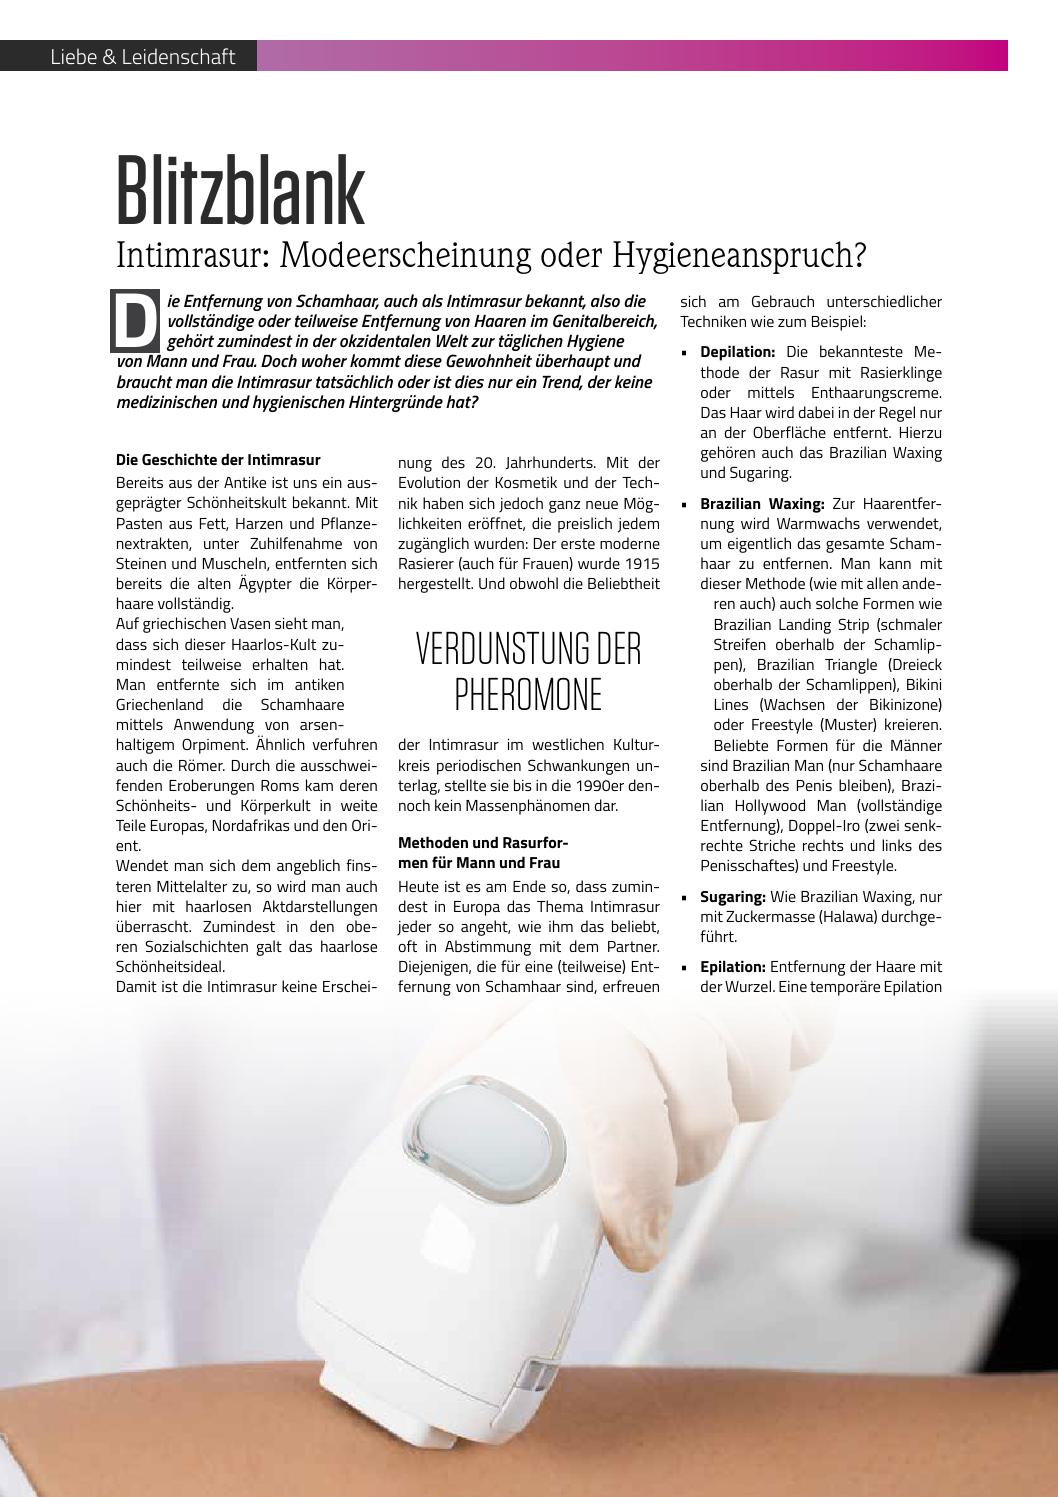 Intimrasur Mittelalter Intimrasur Fur Mann Und Frau 2019 02 18